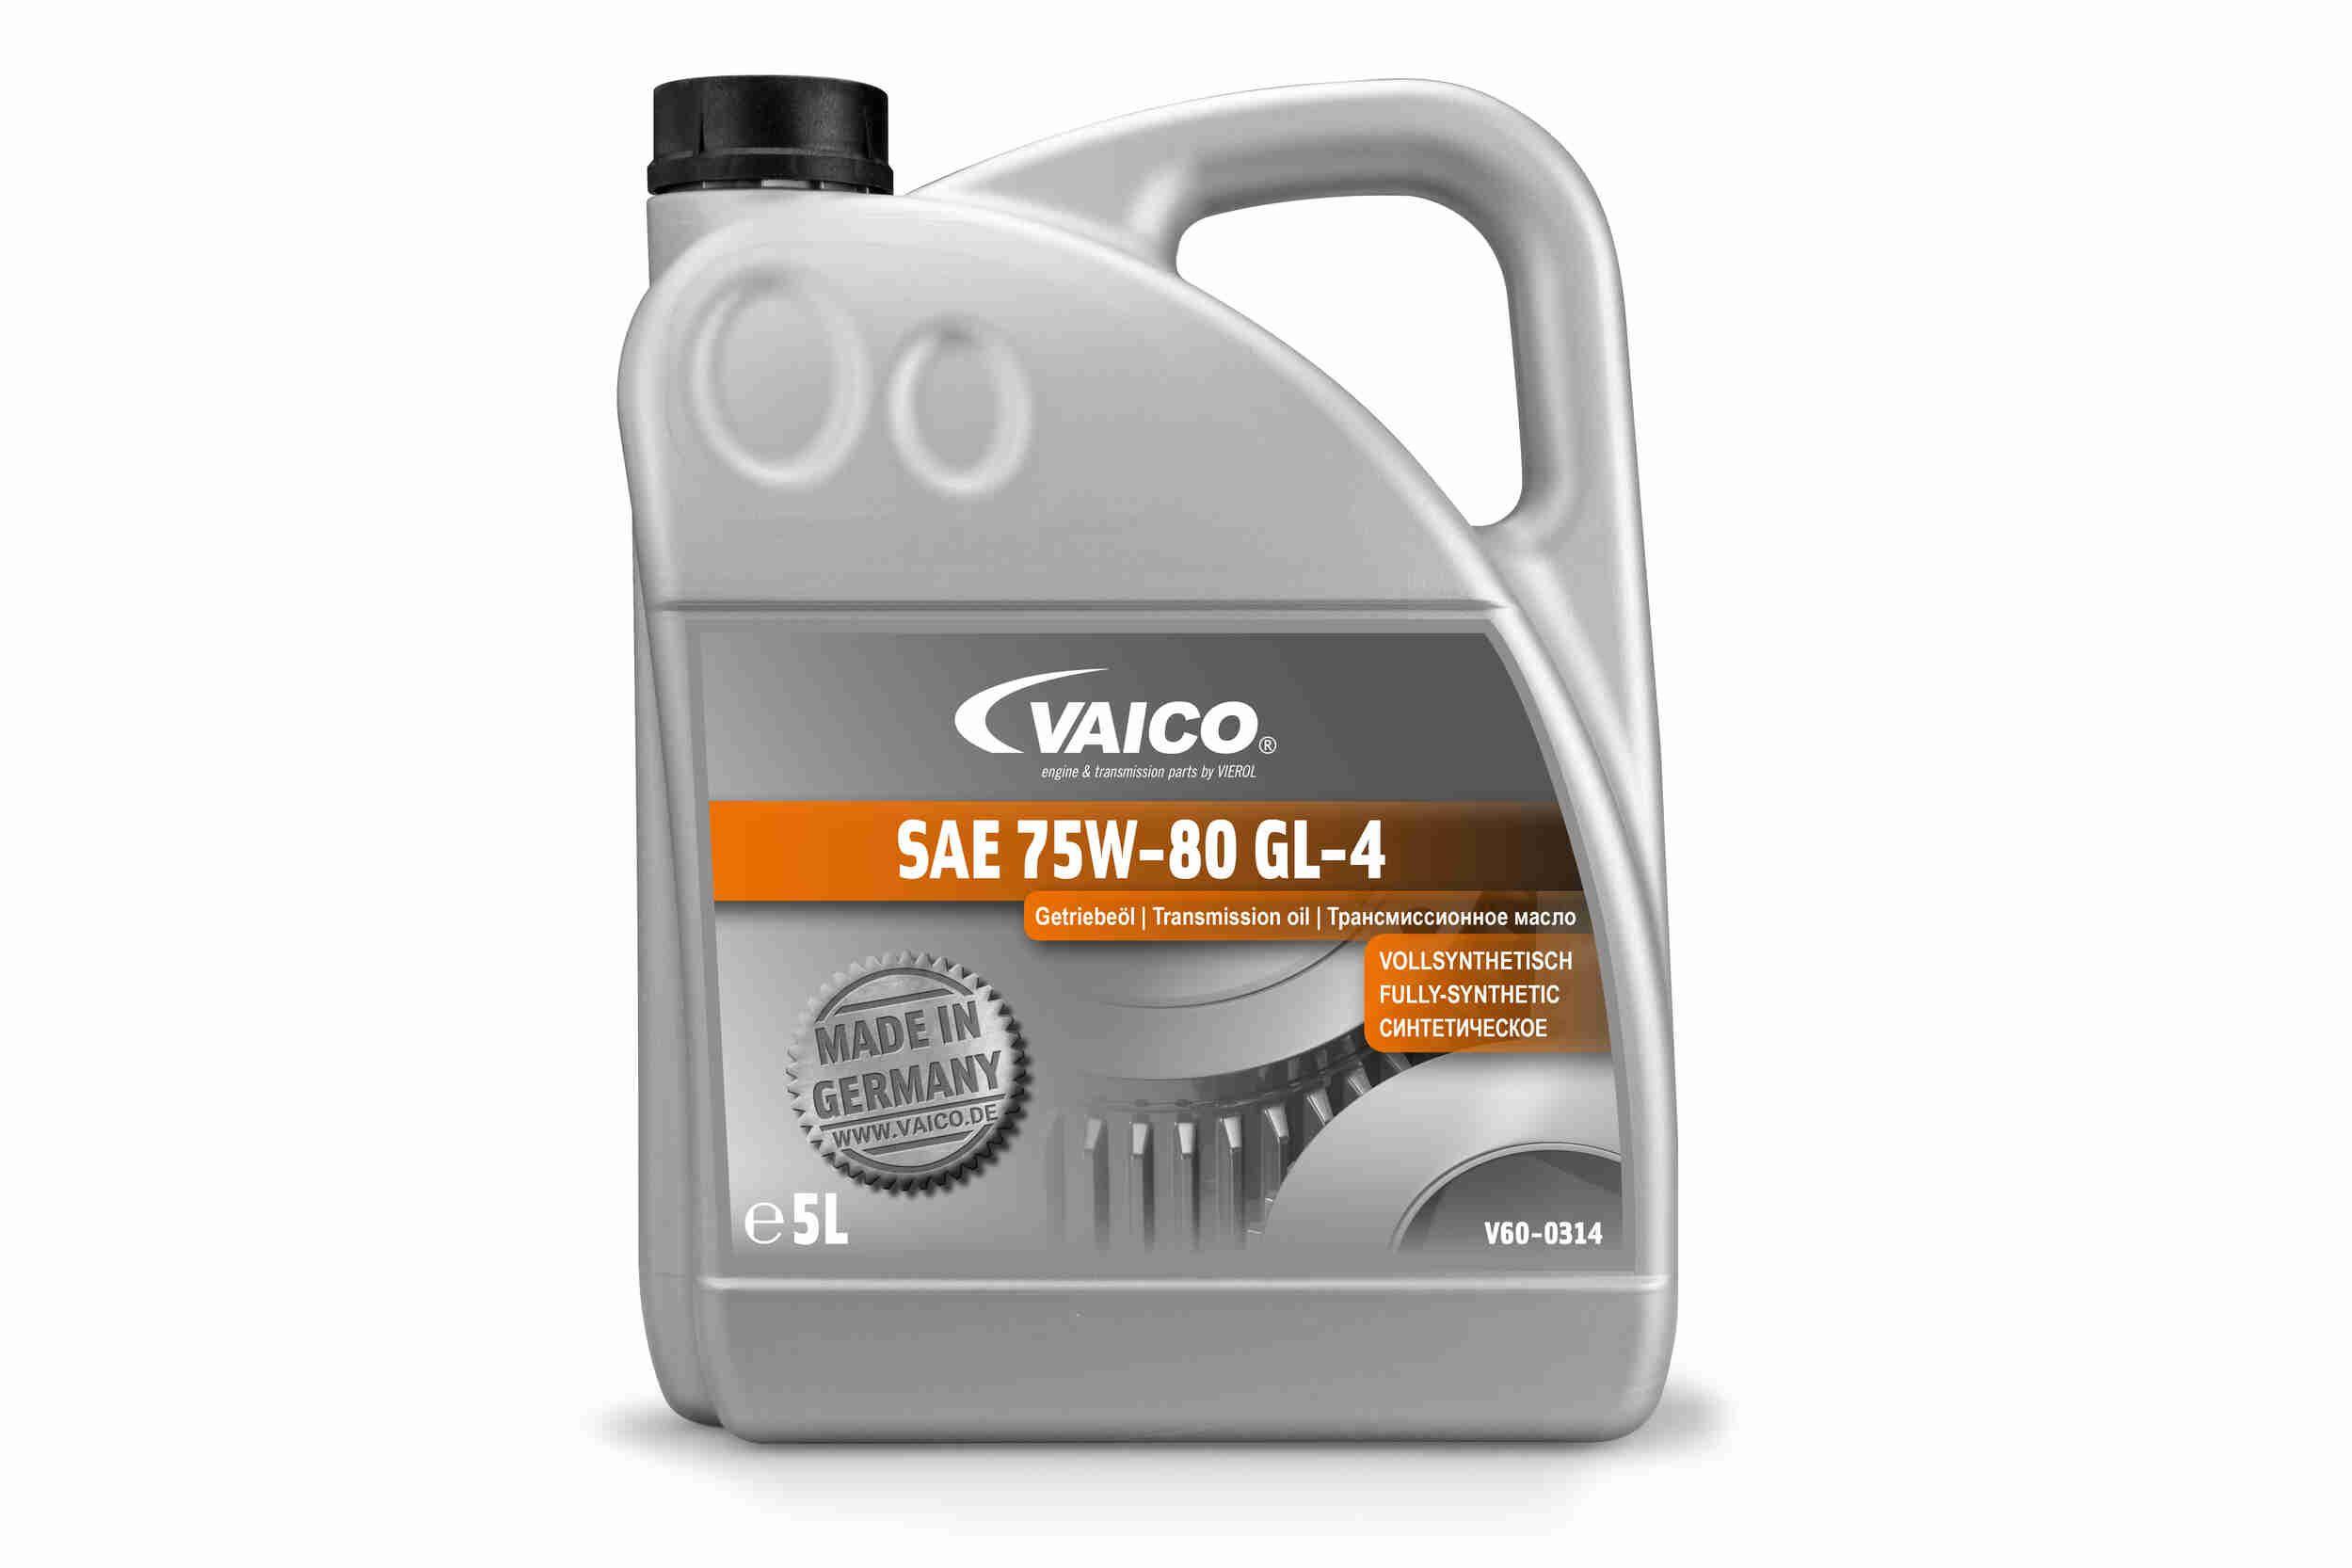 MERCEDES-BENZ CITAN 2018 Kardanwellen & Differential - Original VAICO V60-0314